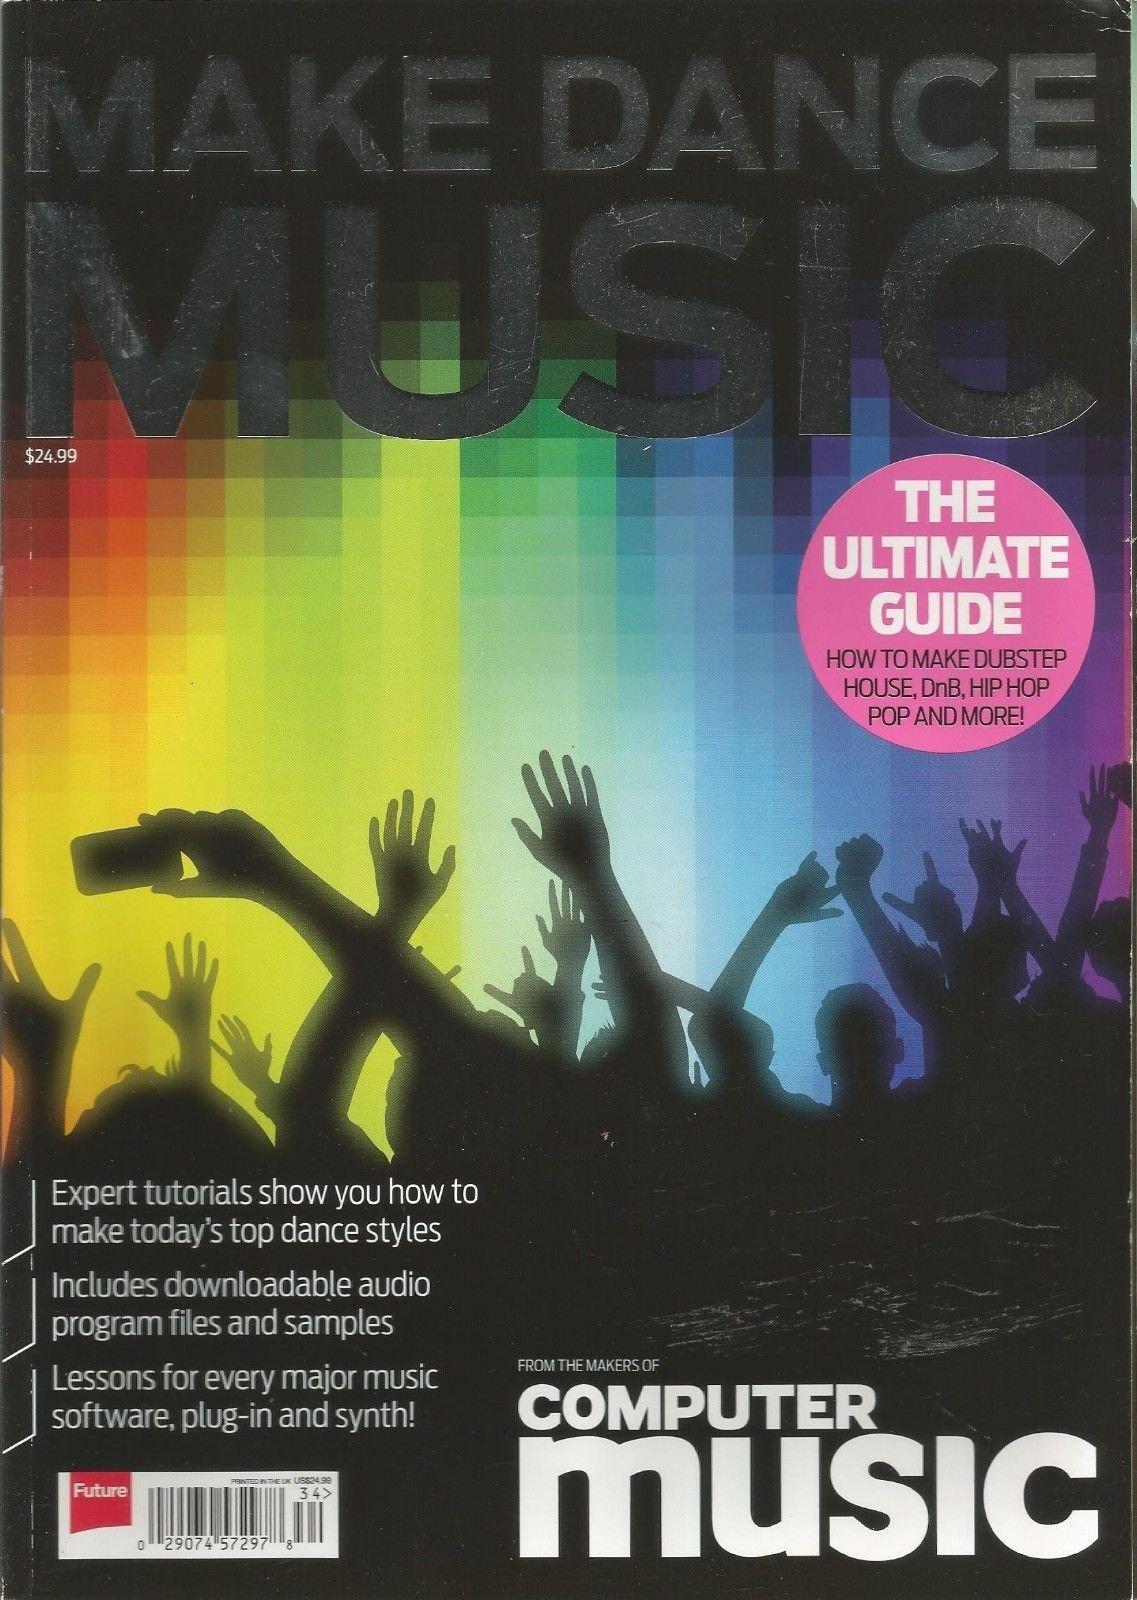 MAKE DANCE MUSIC, COMPUTER MUSIC, AUTUMN 2010 ~